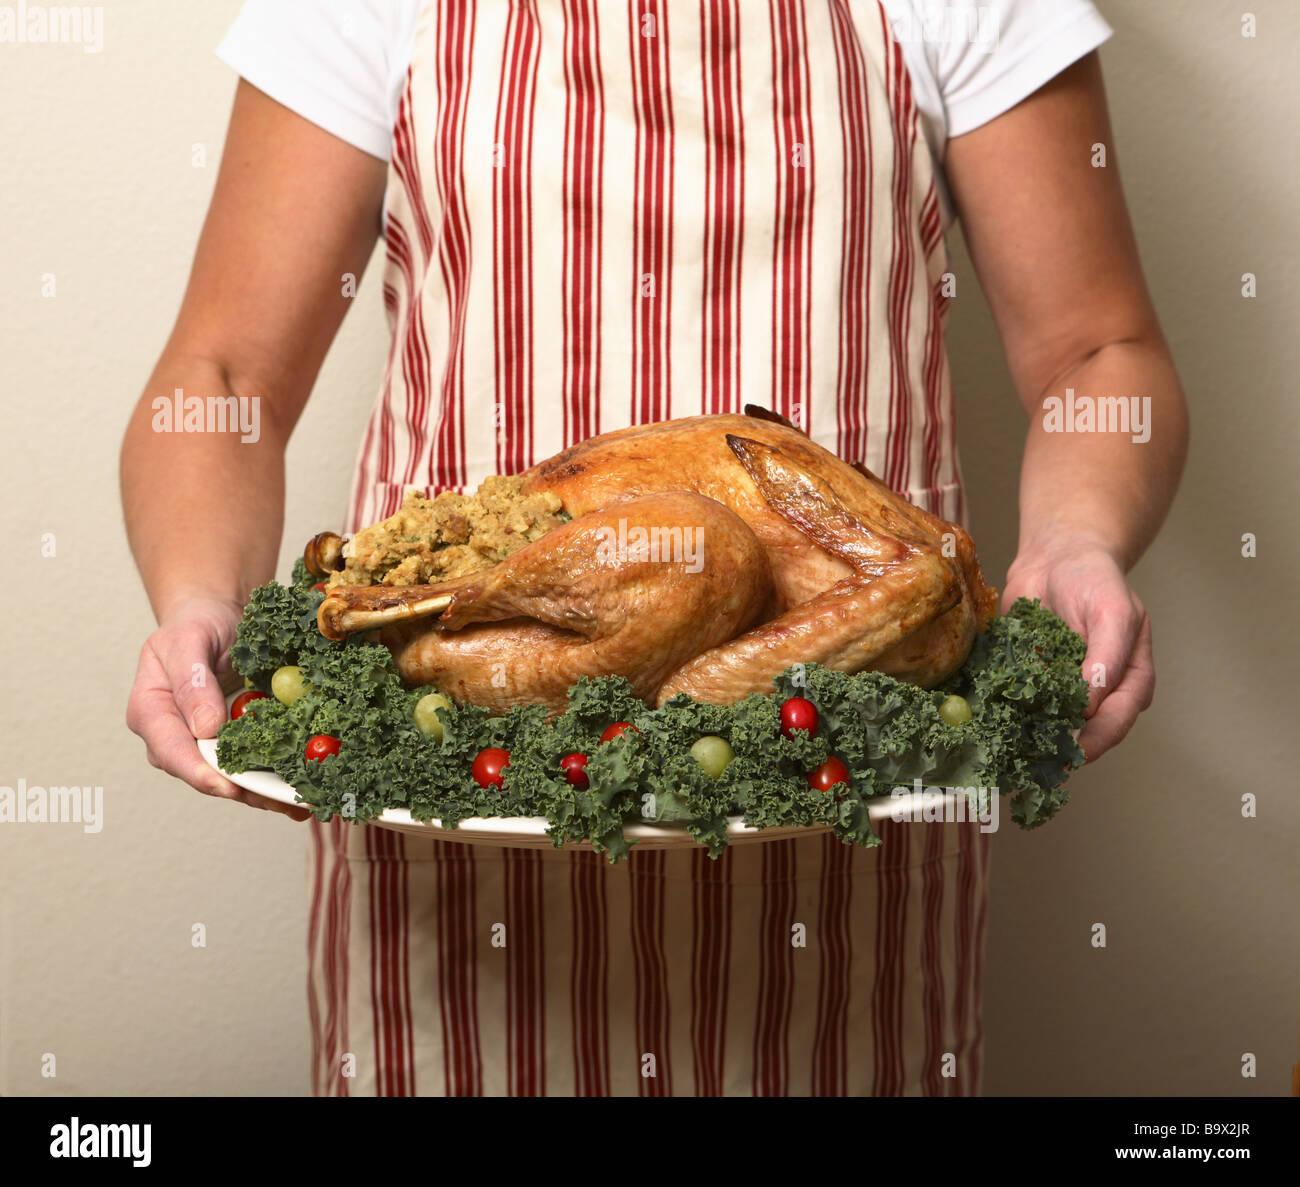 Person Holding Thanksgiving Turkey Stockfotos & Person Holding ...